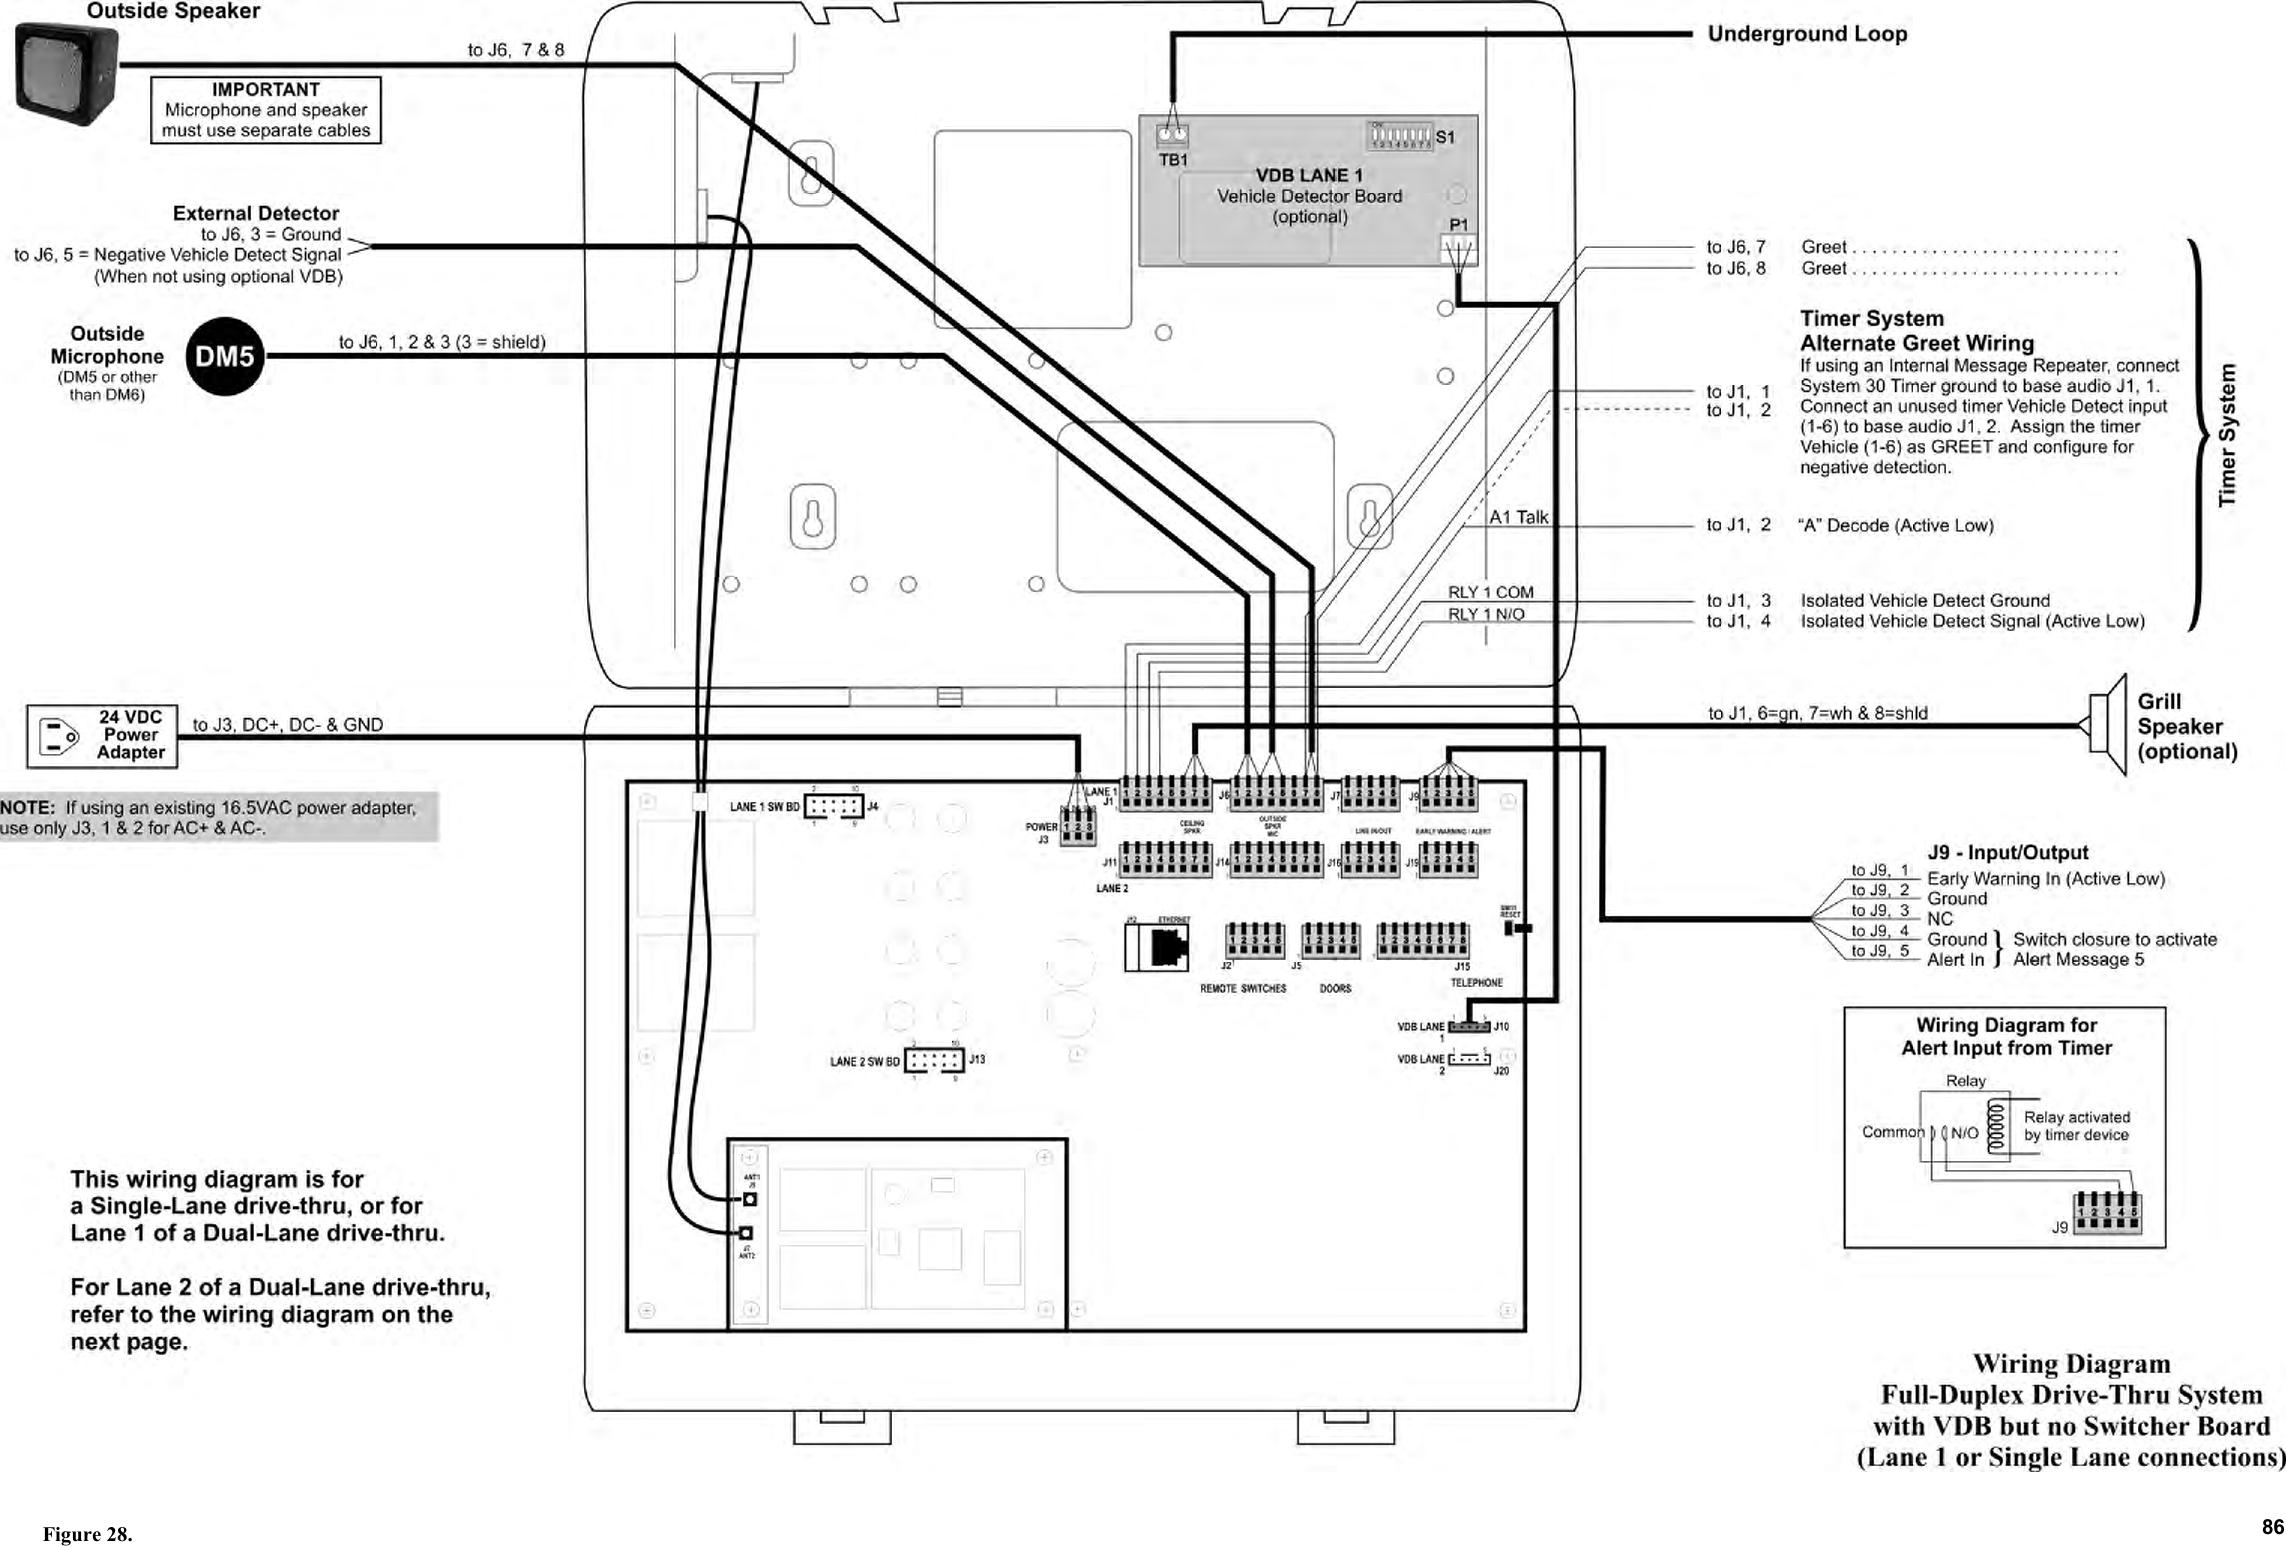 kikkerland wireless earbuds instructions